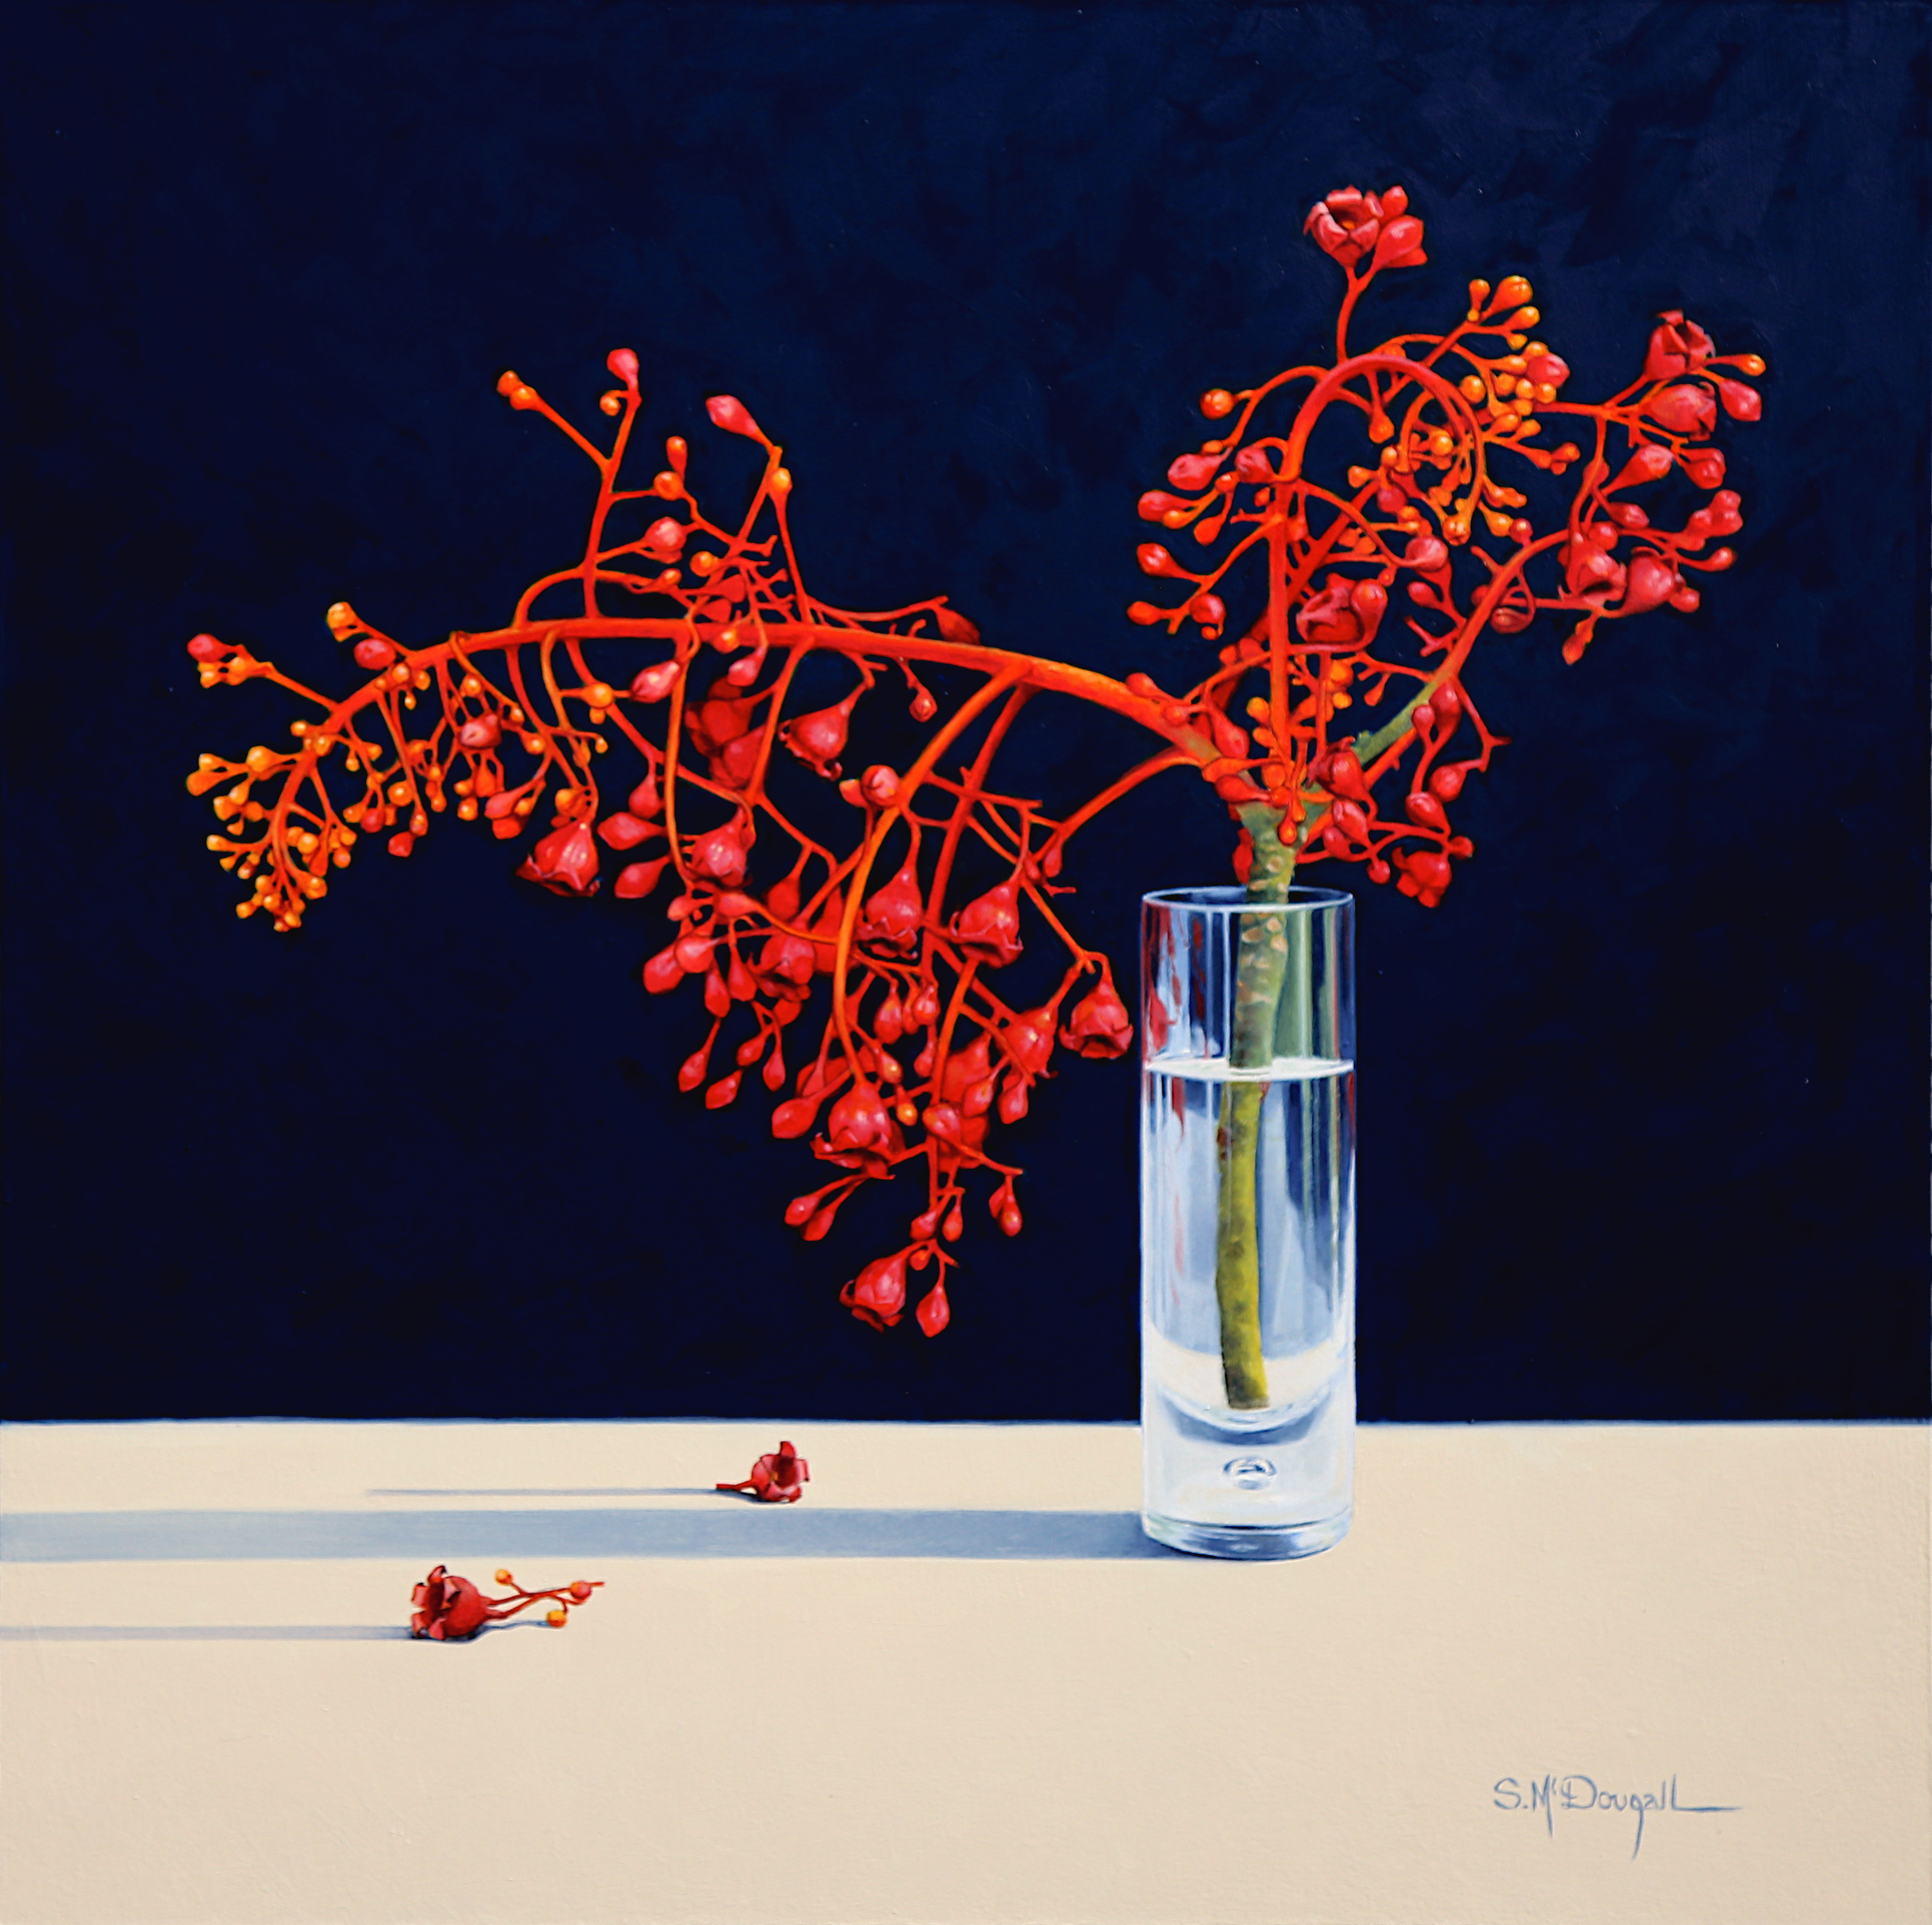 Art Atrium Scott McDougall Illawarra flame tree